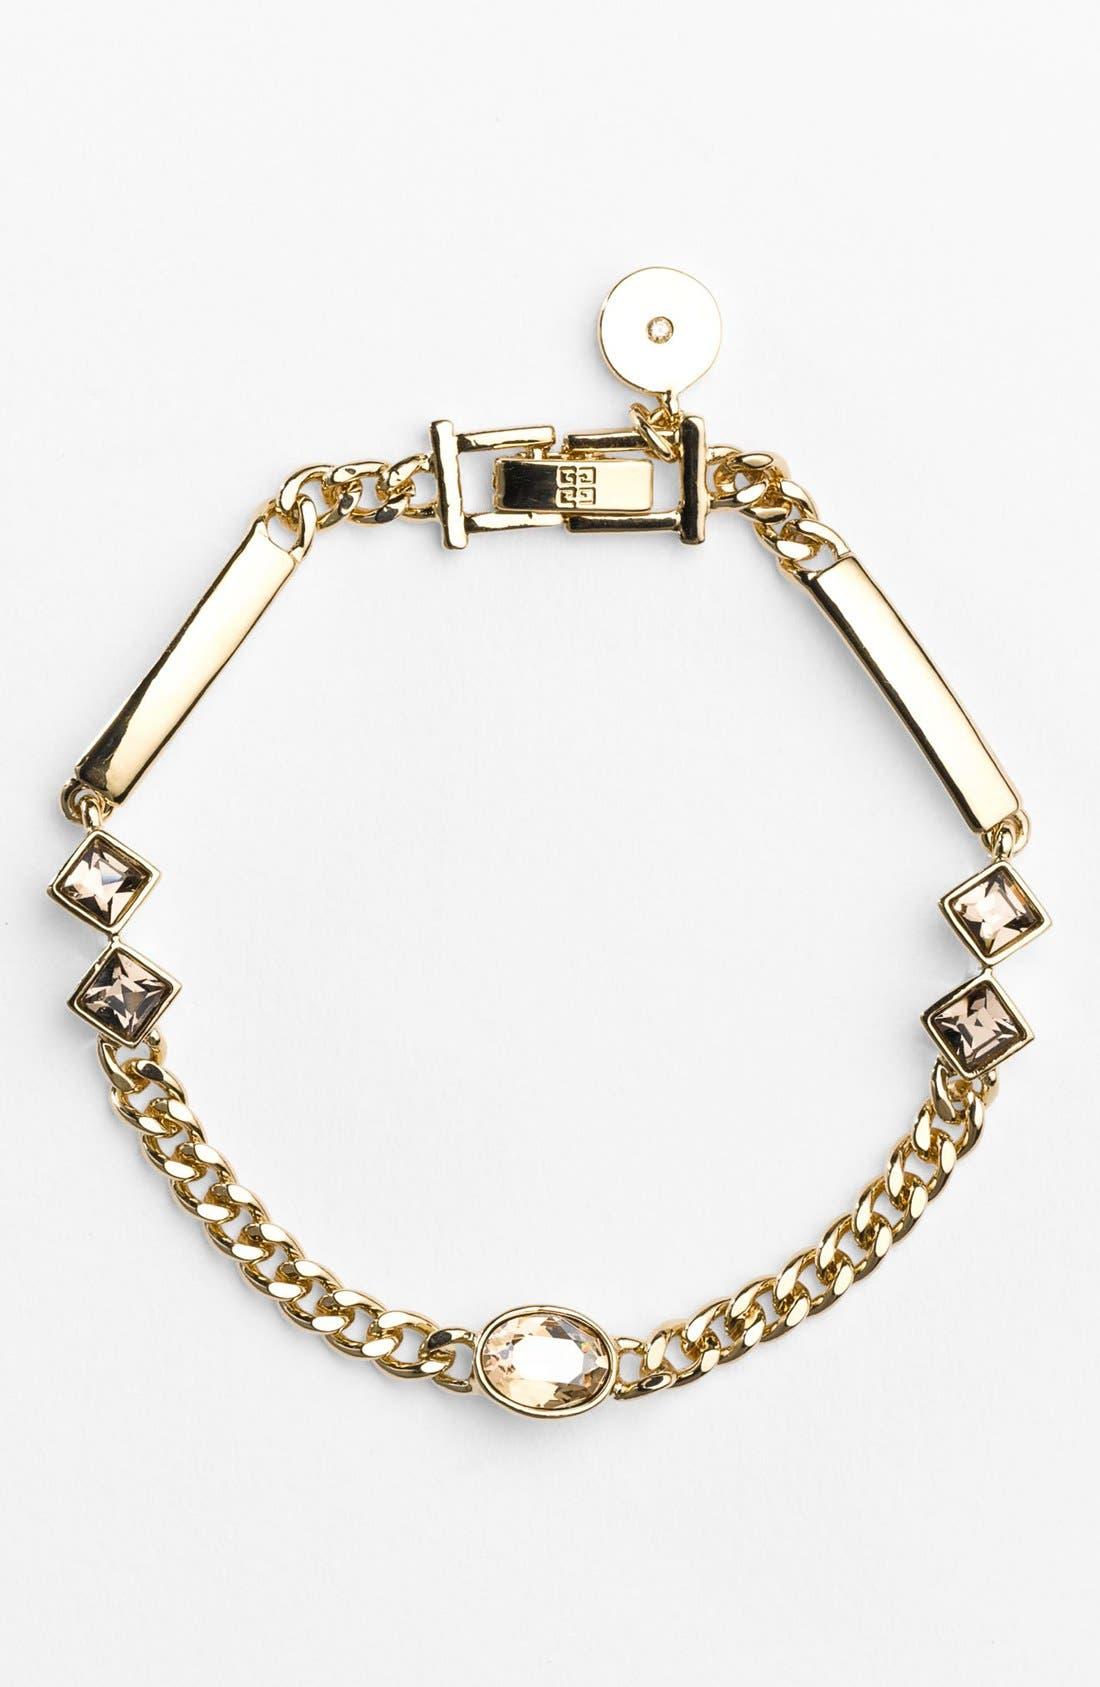 Main Image - Givenchy Station Line Bracelet